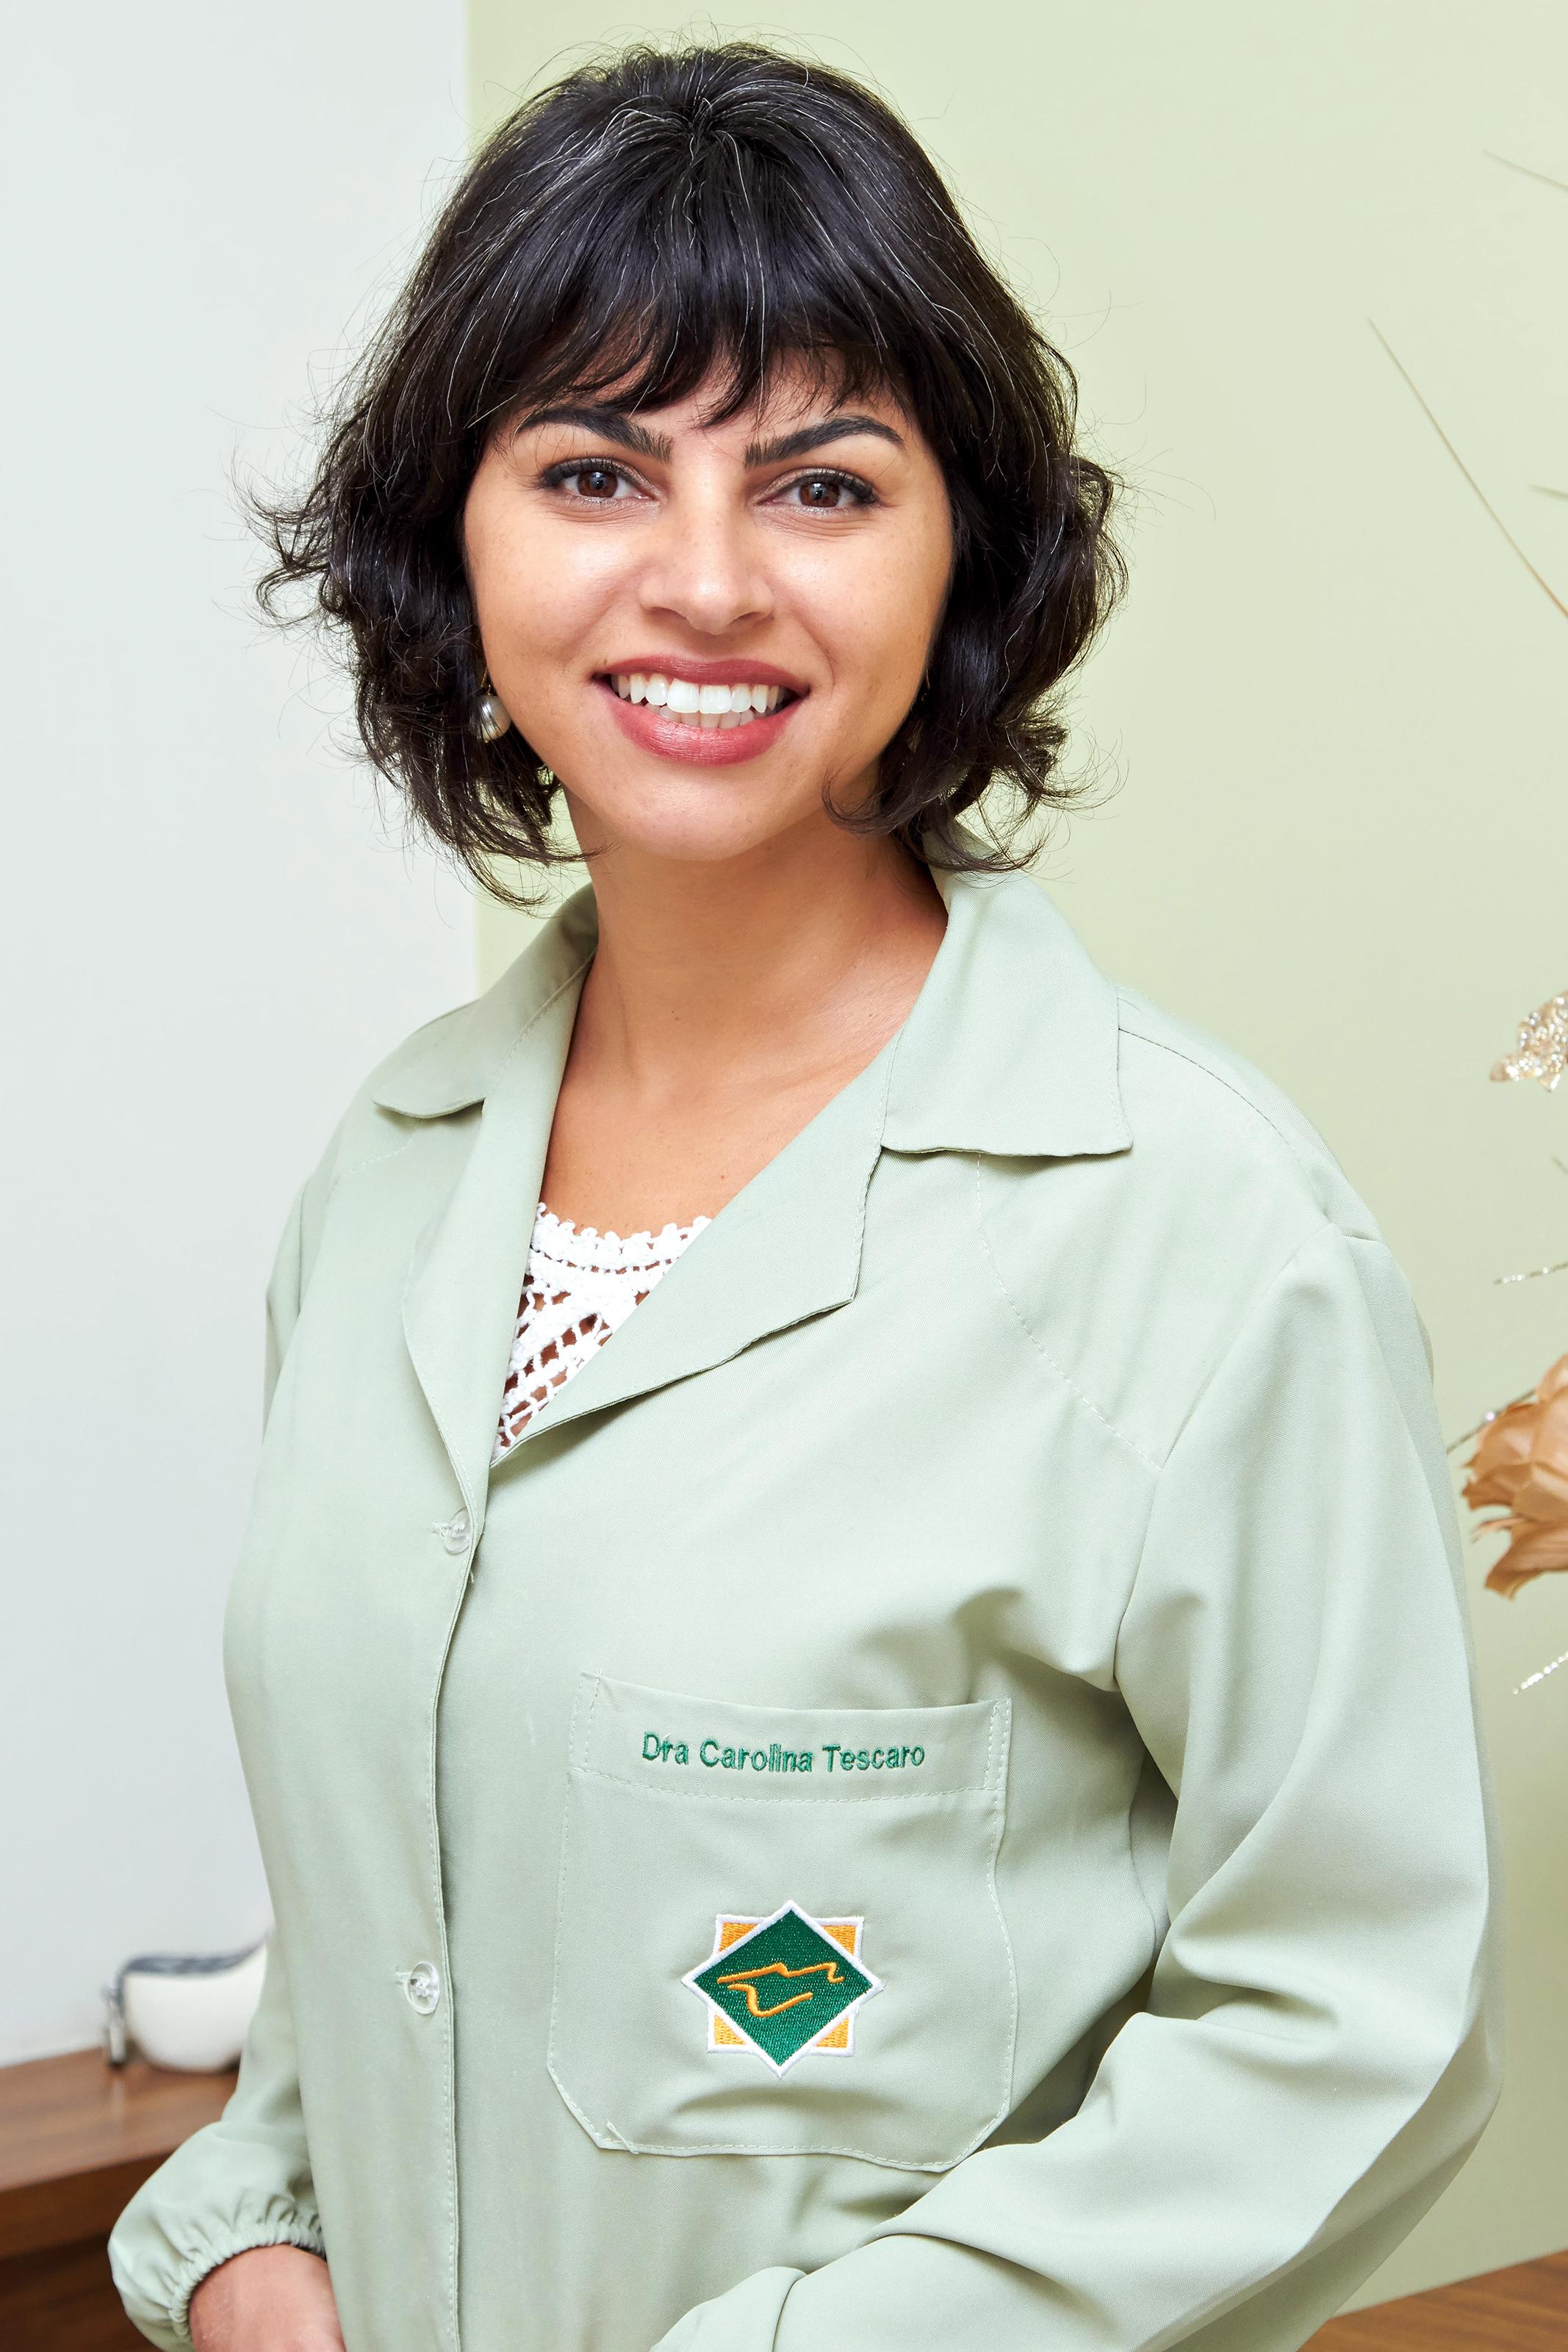 Dra. Carolina Tescaro